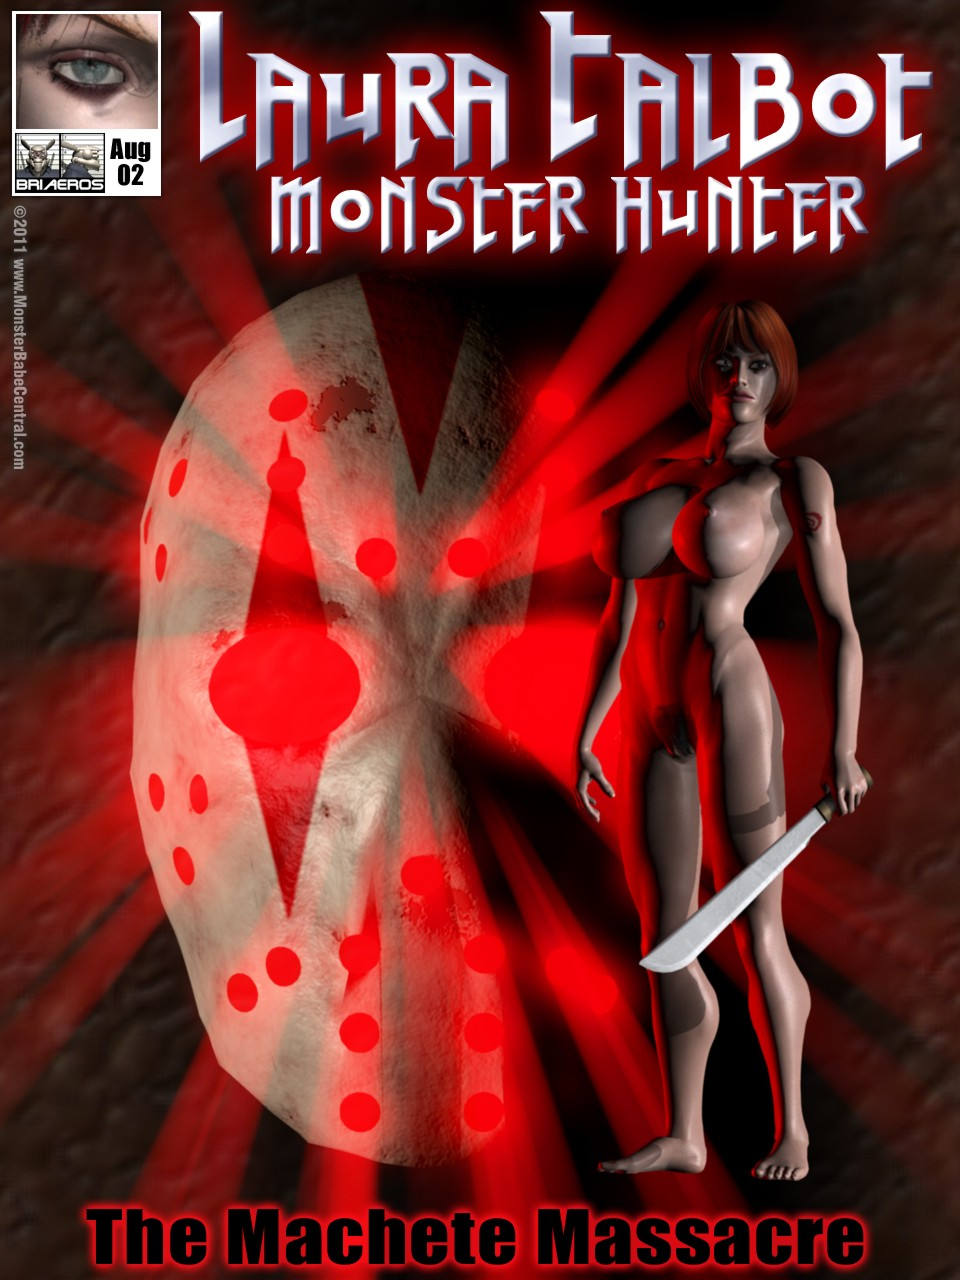 Porn Comics - Laura Talbot Monster Hunter – Issue 2 porn comics 8 muses